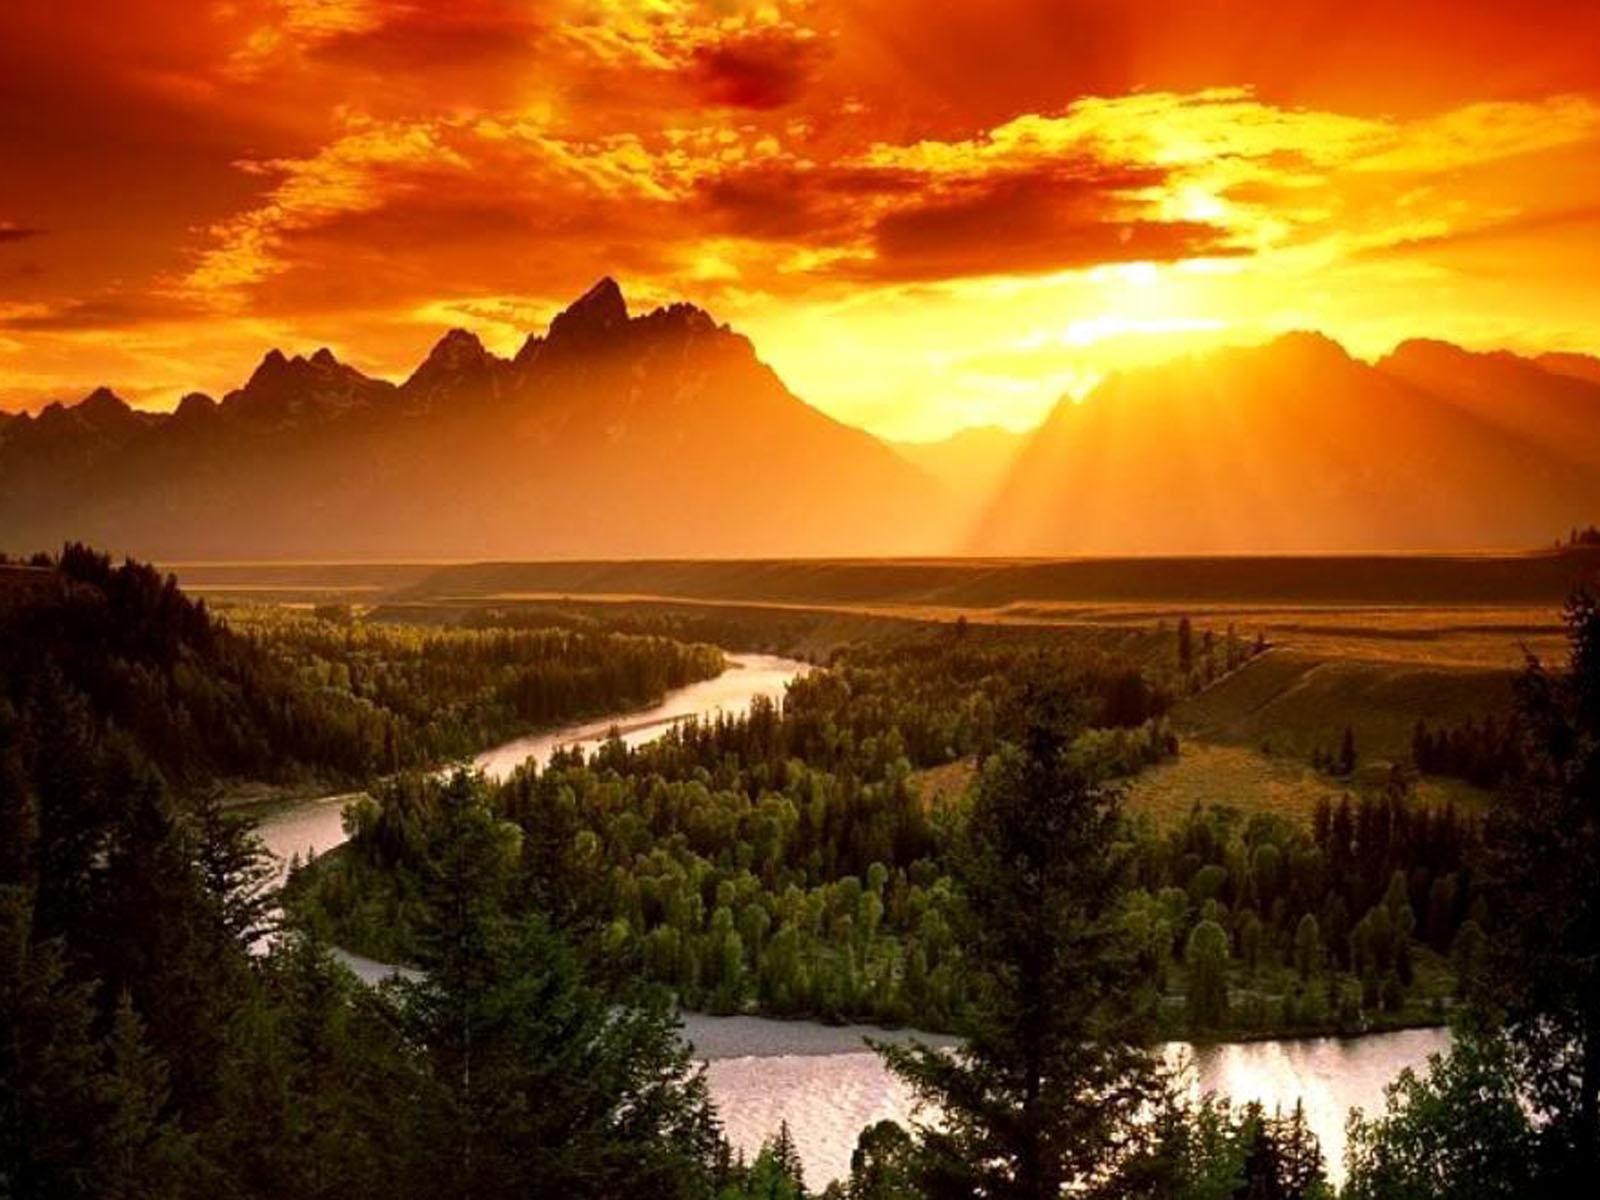 Tarzan Car Wallpaper Free Download Wallpapers Mountain Sunrise Wallpapers